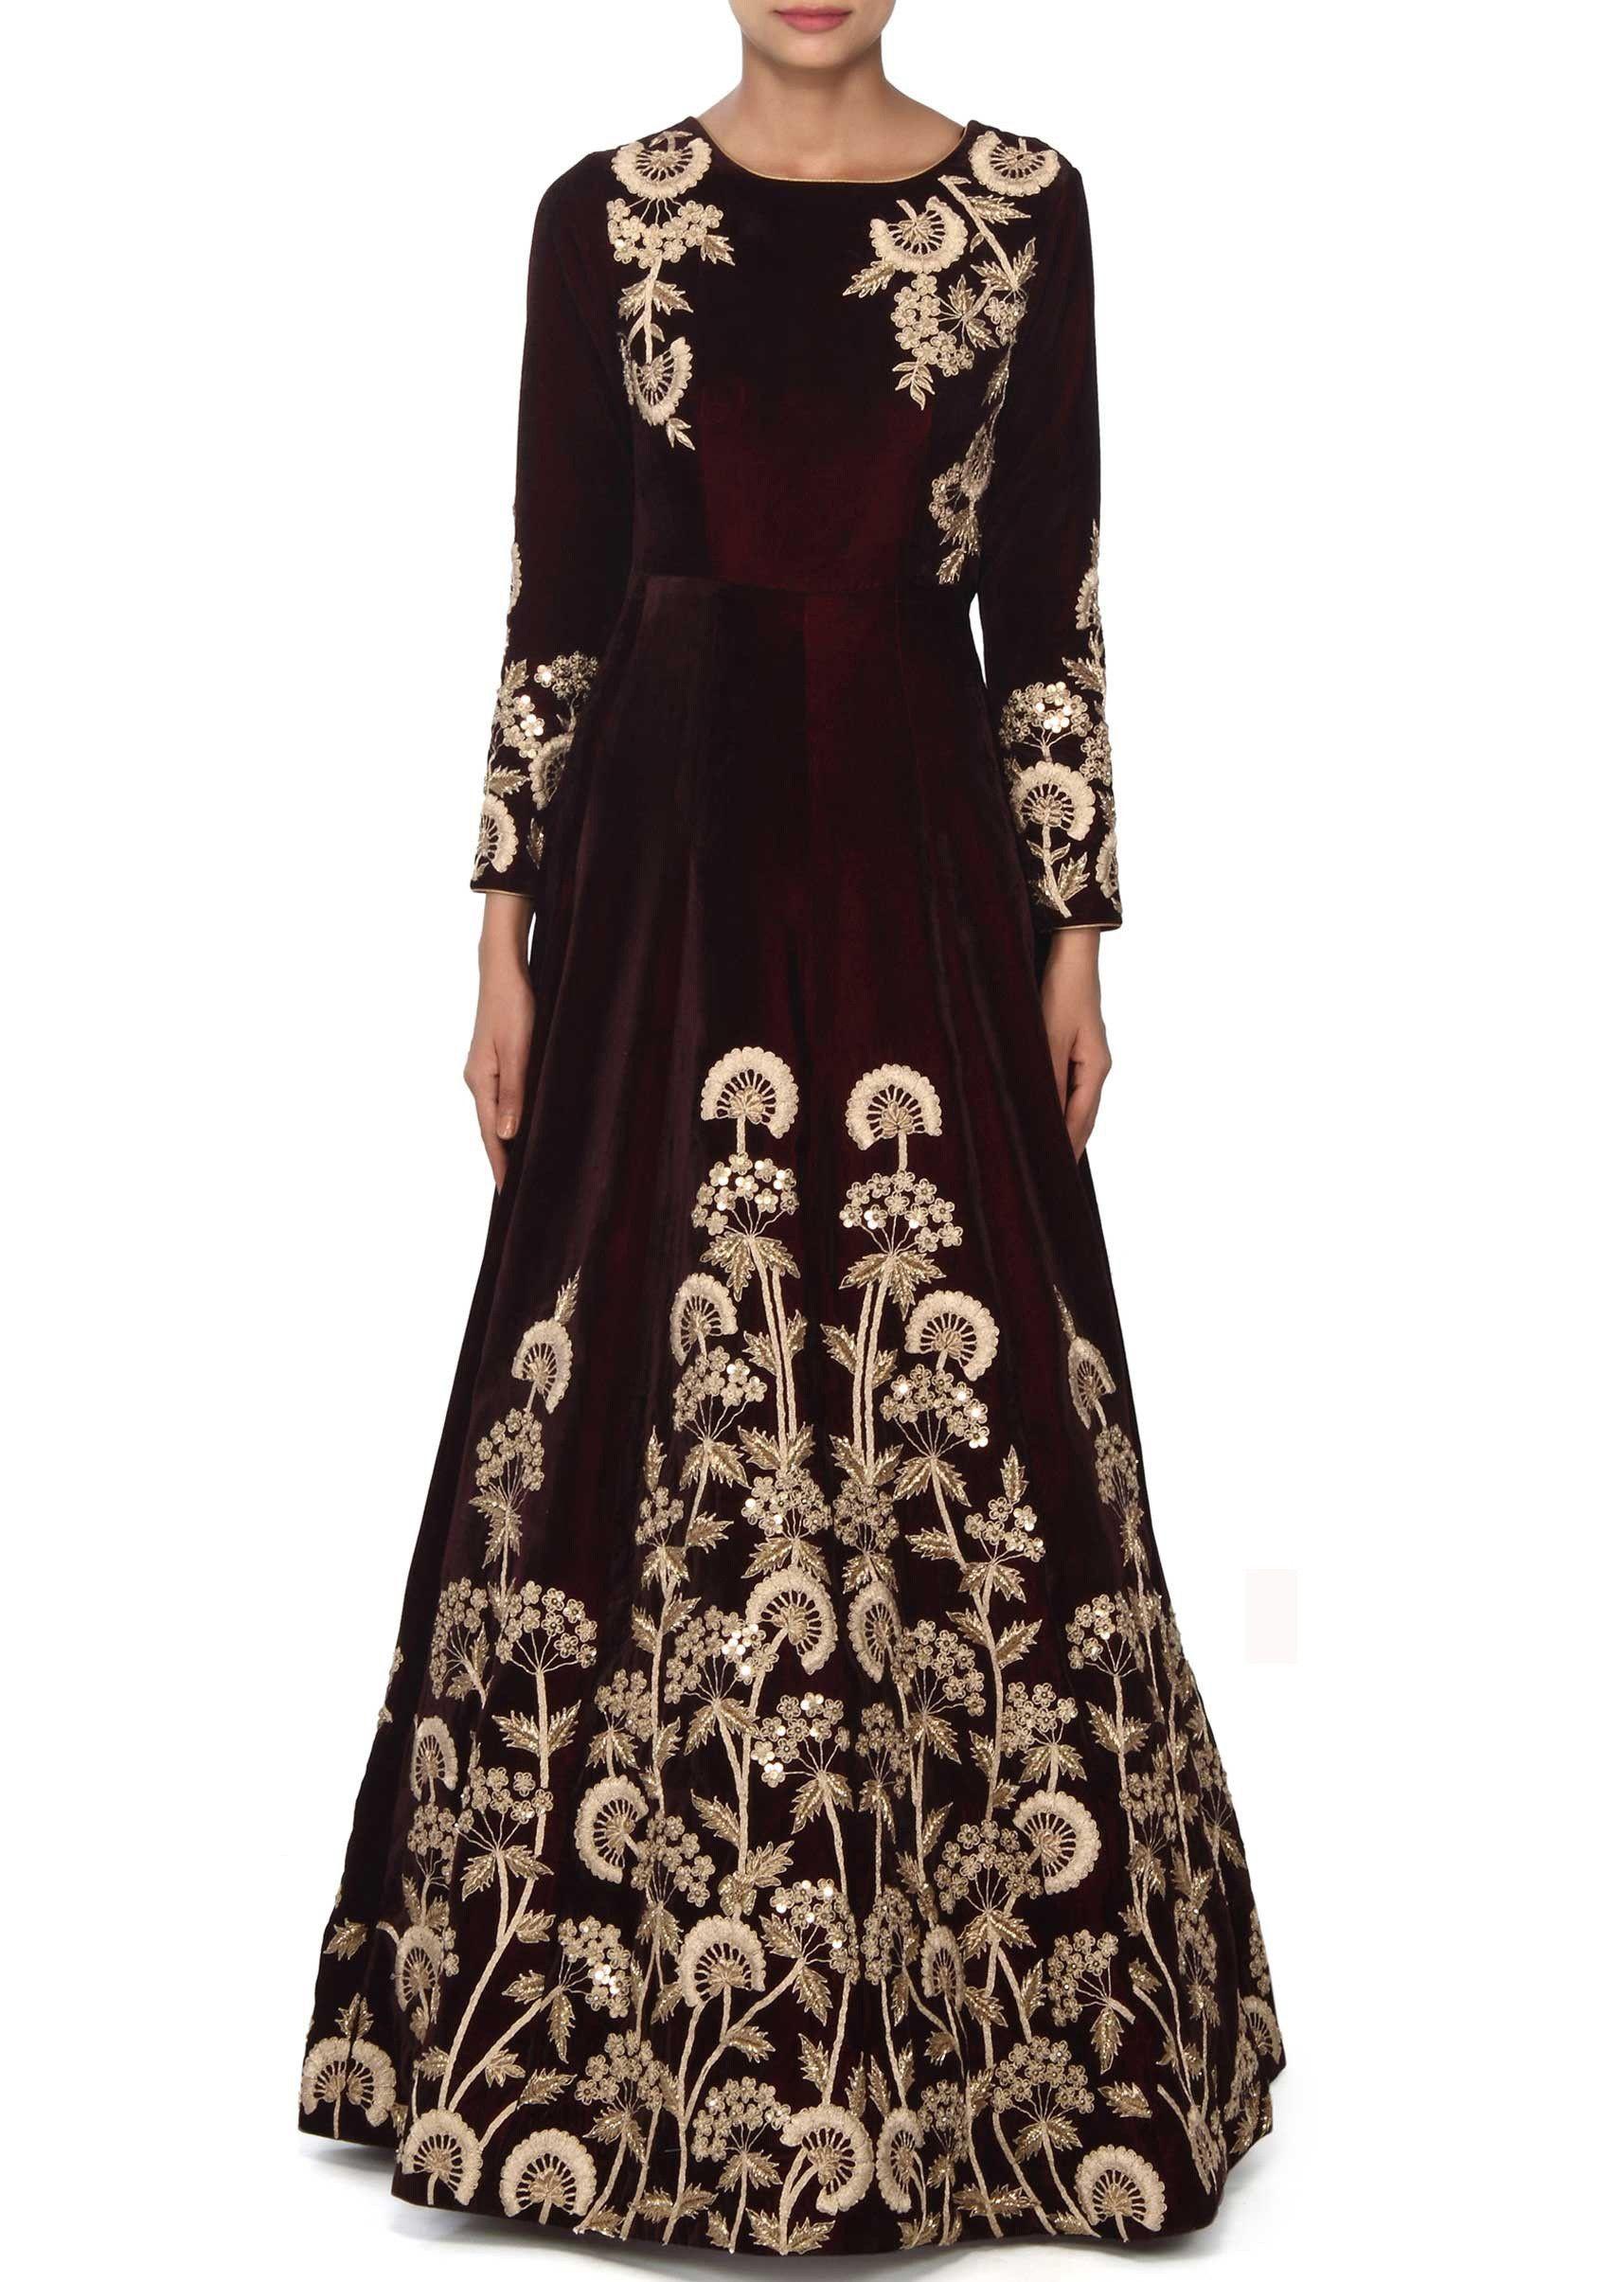 Buy Online Summer Style Women Gown In Brown Color With Aari ...